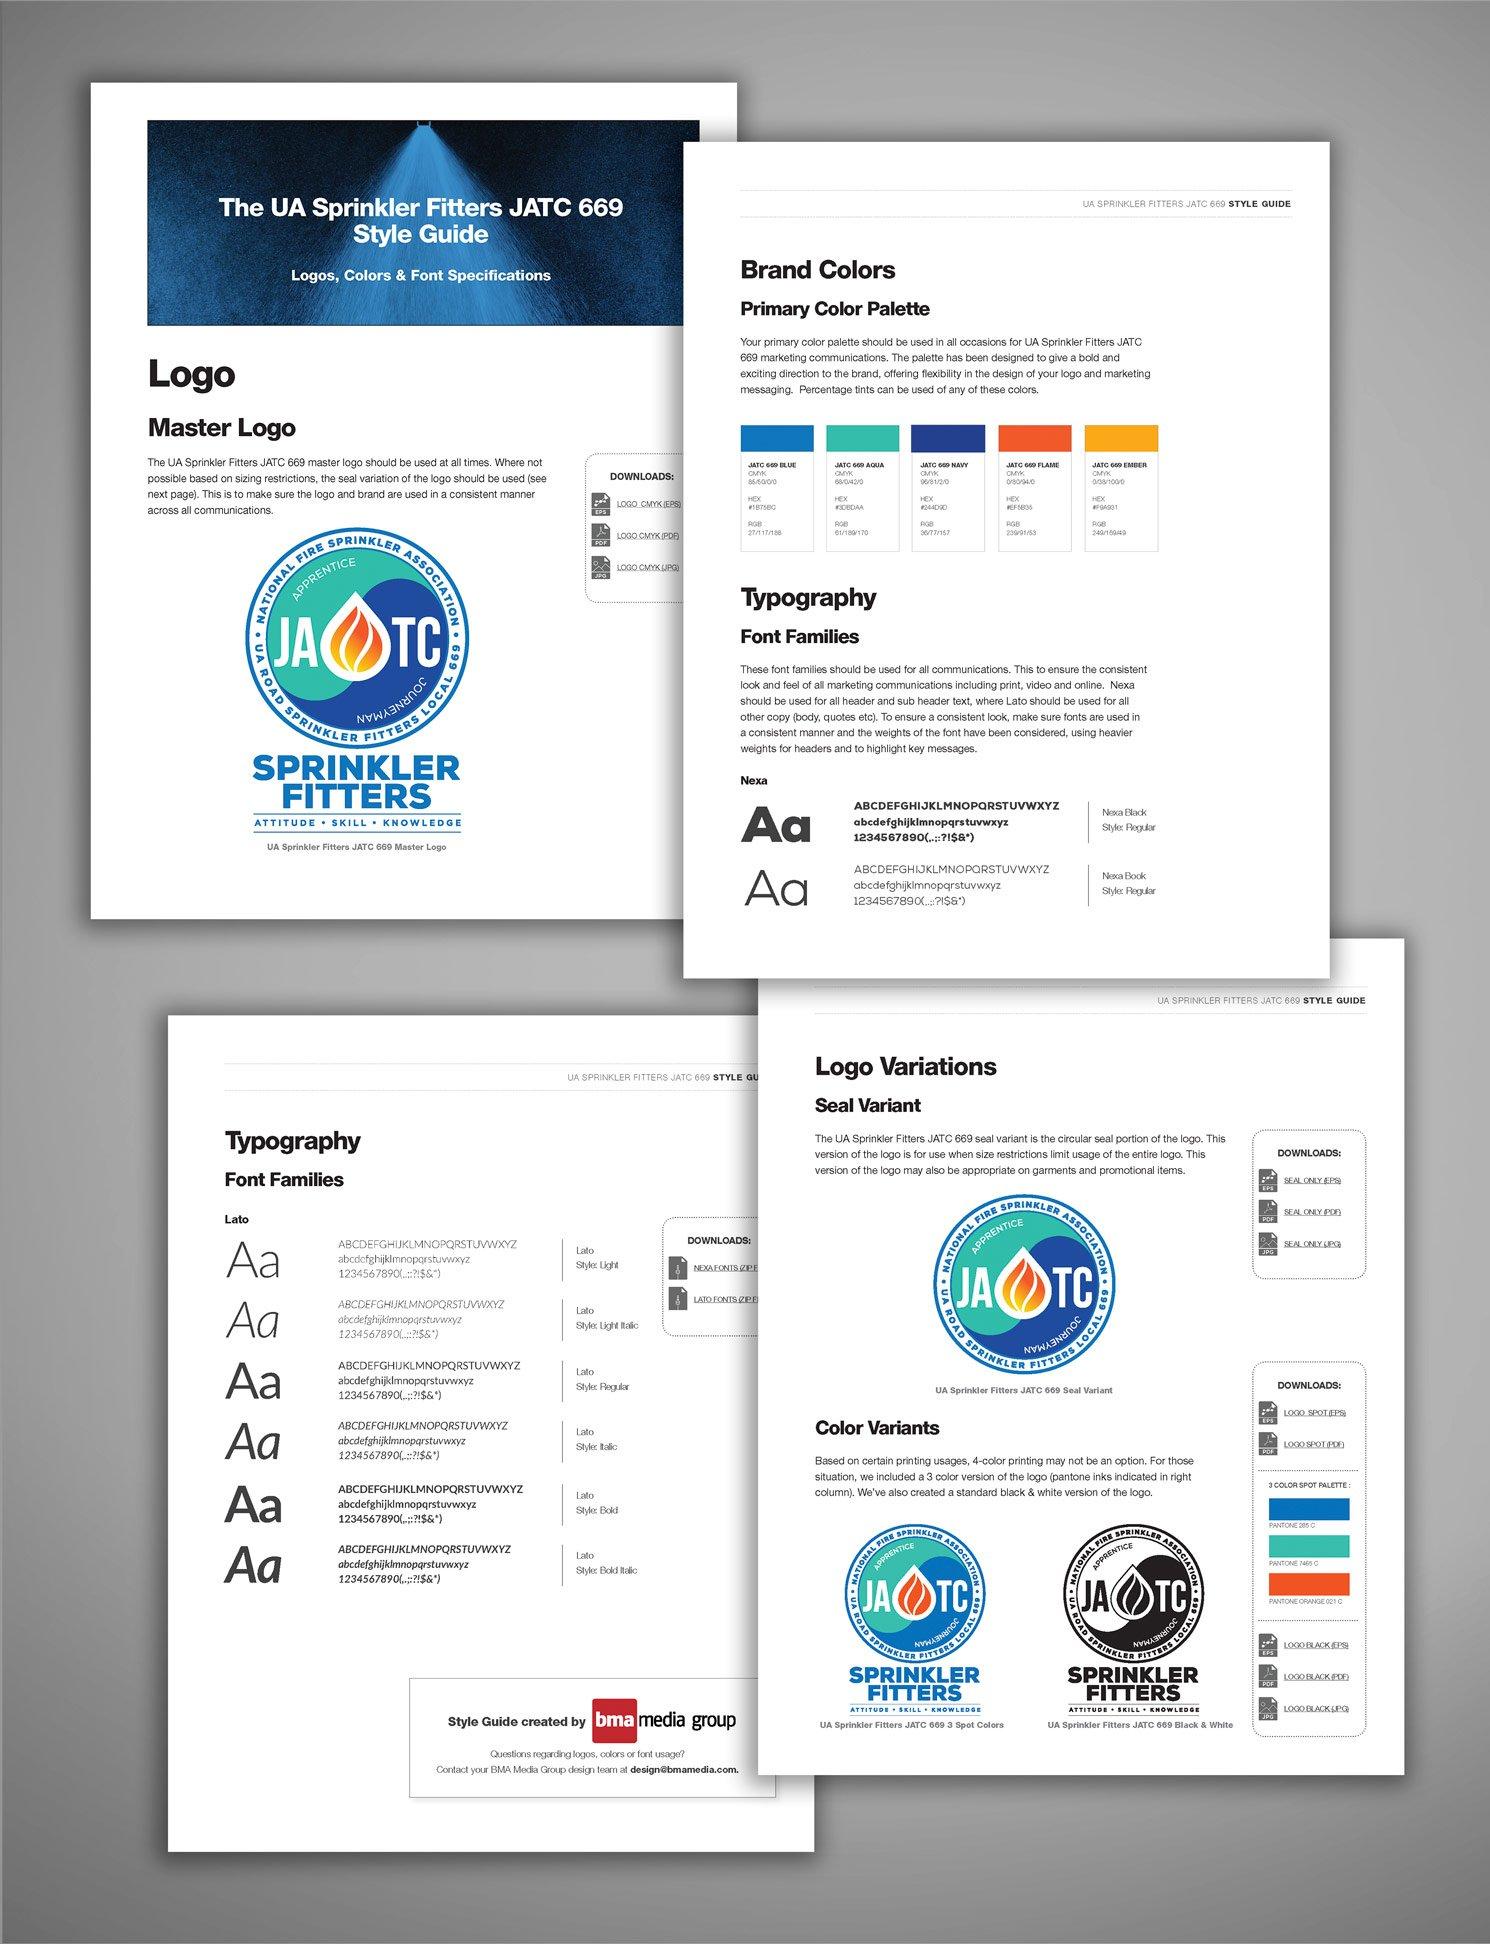 ua sprinkler fitters 669 jatc union branding campaign